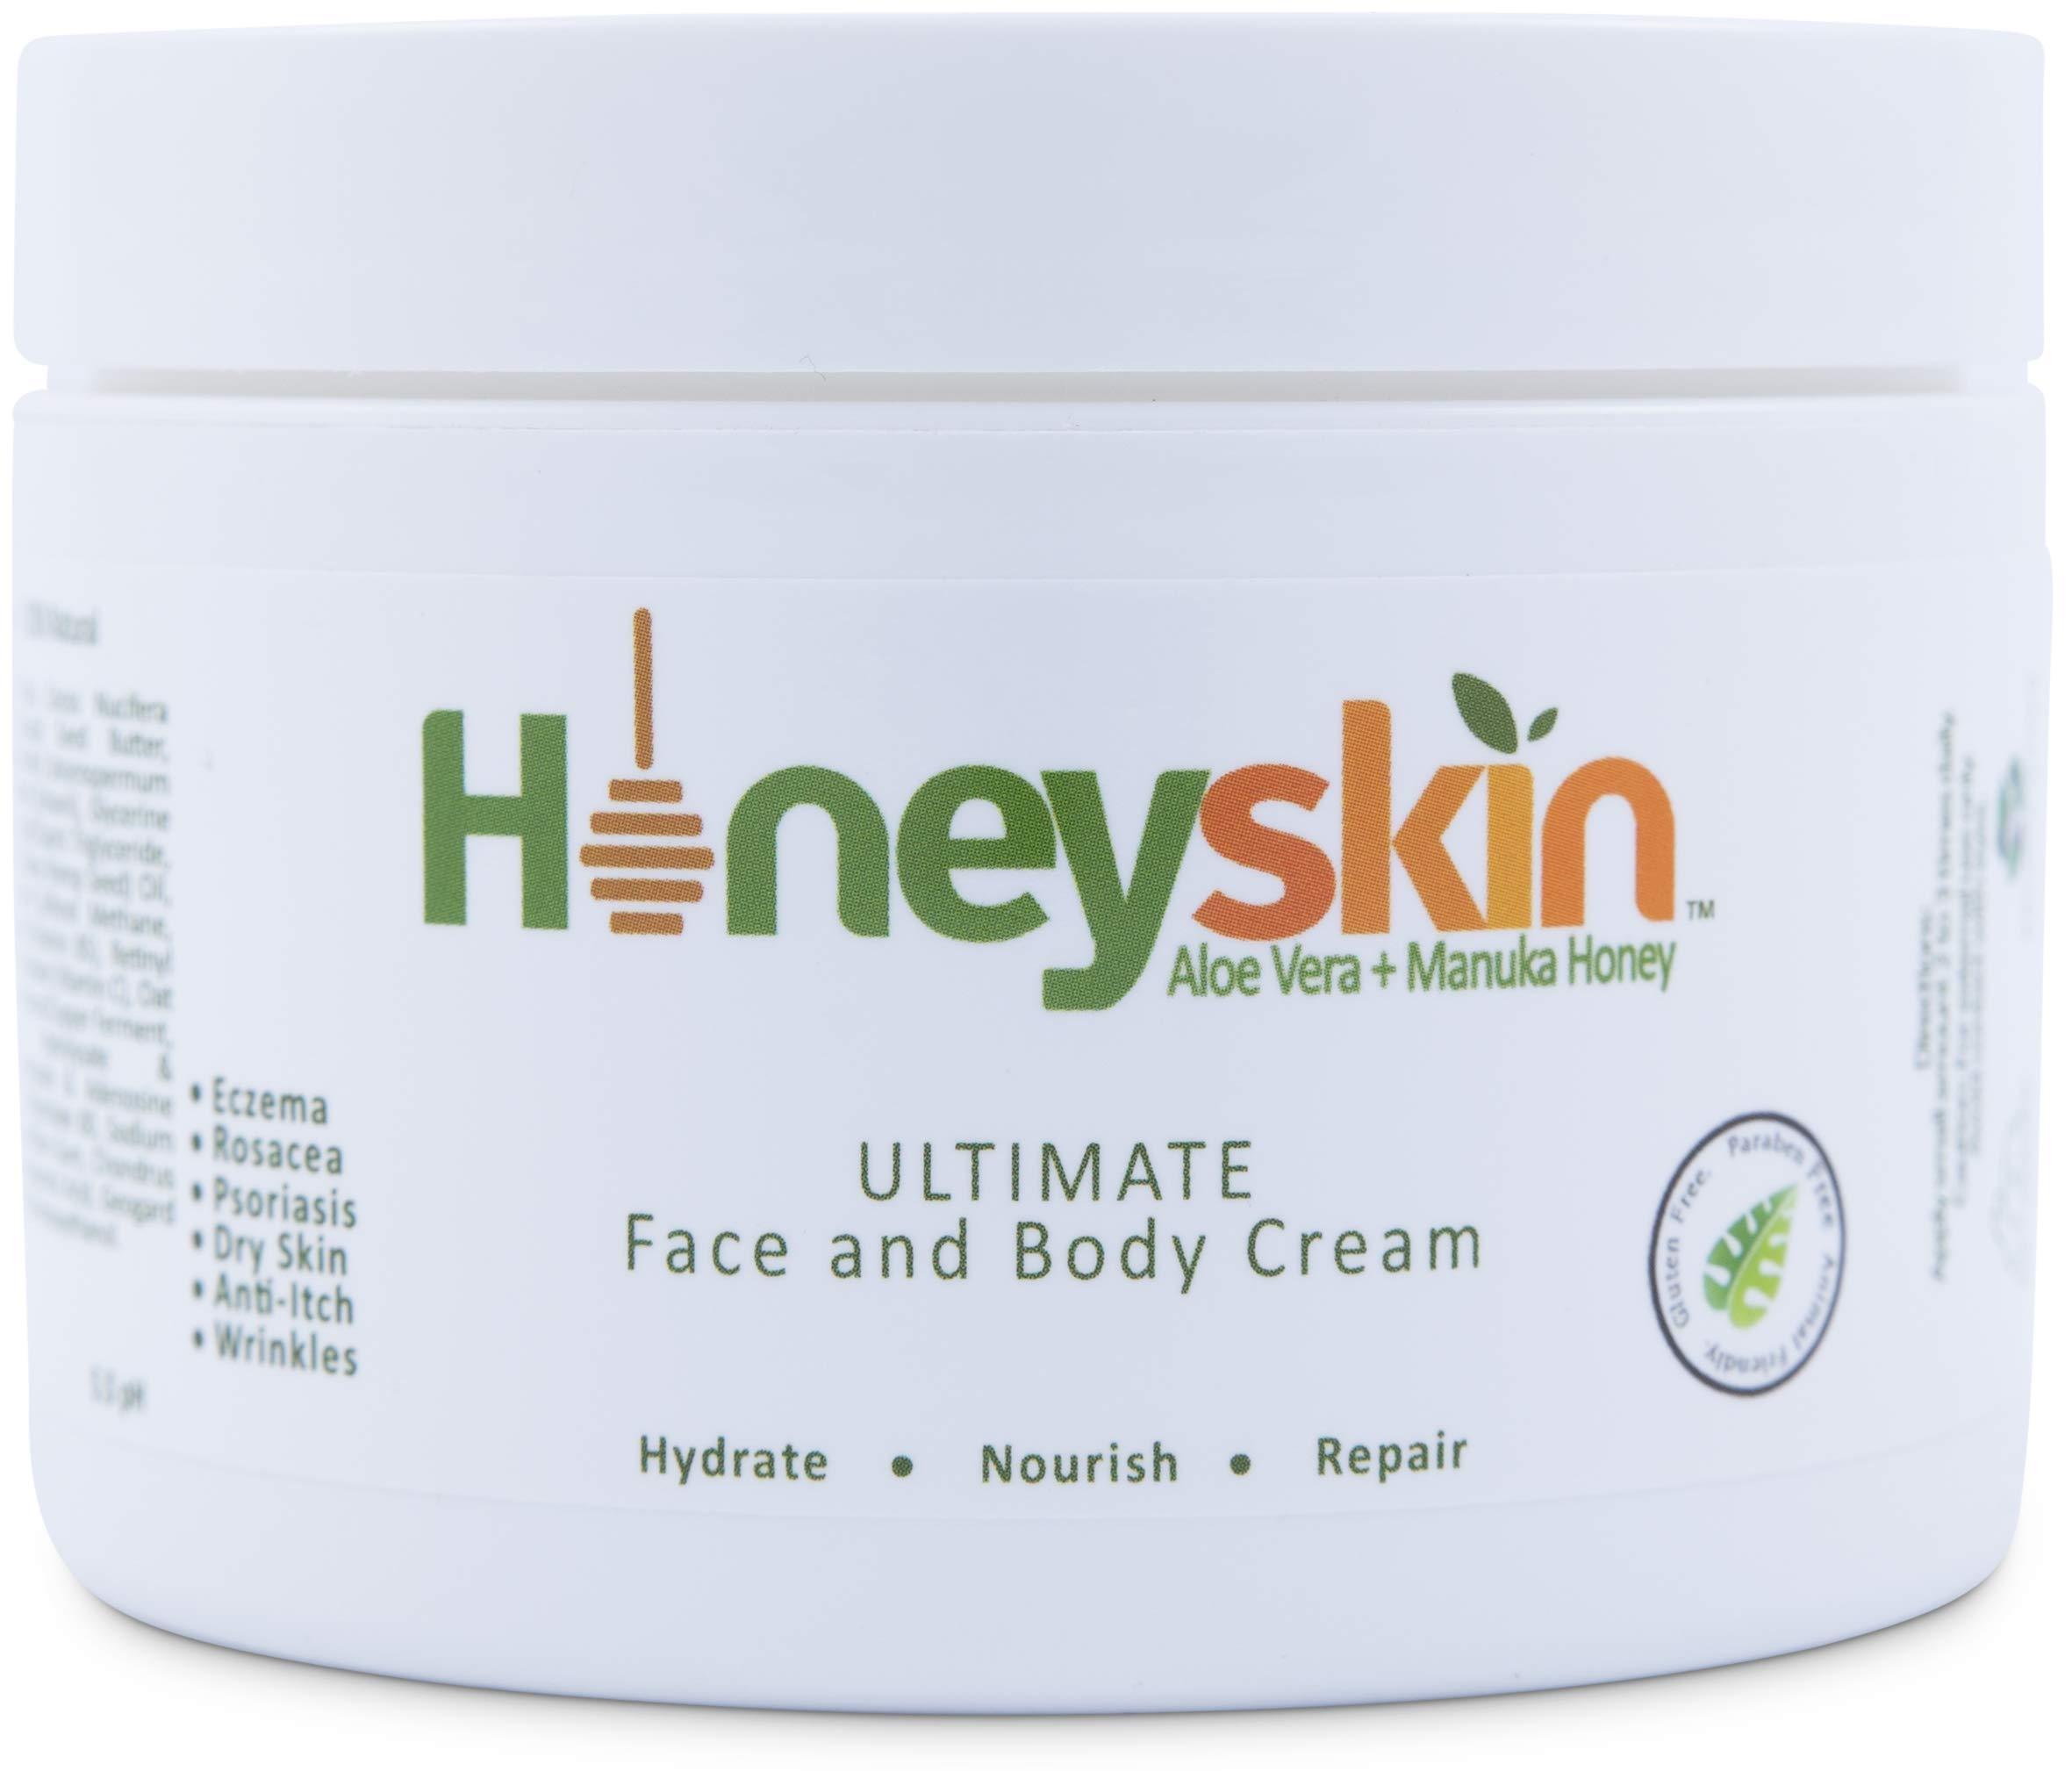 Face and Body Cream Moisturizer - Nourishing Aloe Vera - Manuka Honey for Rosacea Eczema Psoriasis Rashes Itchiness Redness - Natural Organic Cracked Skin Relief - Anti Aging - Anti Wrinkle (8 oz) by Honeyskin Organics